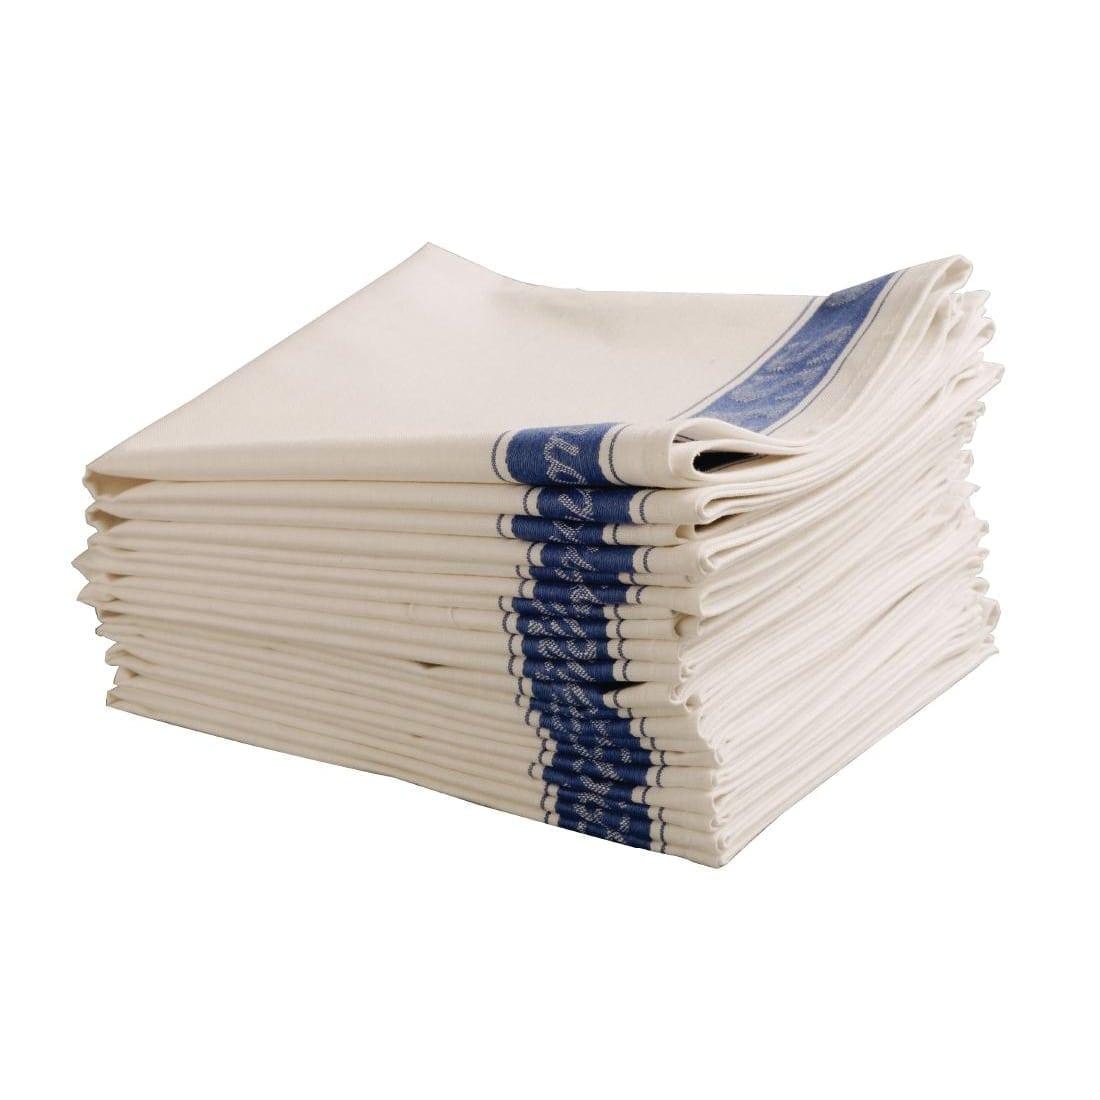 "Glass Cloth Linen Union Blue Border - 30 x 20"" - Each"